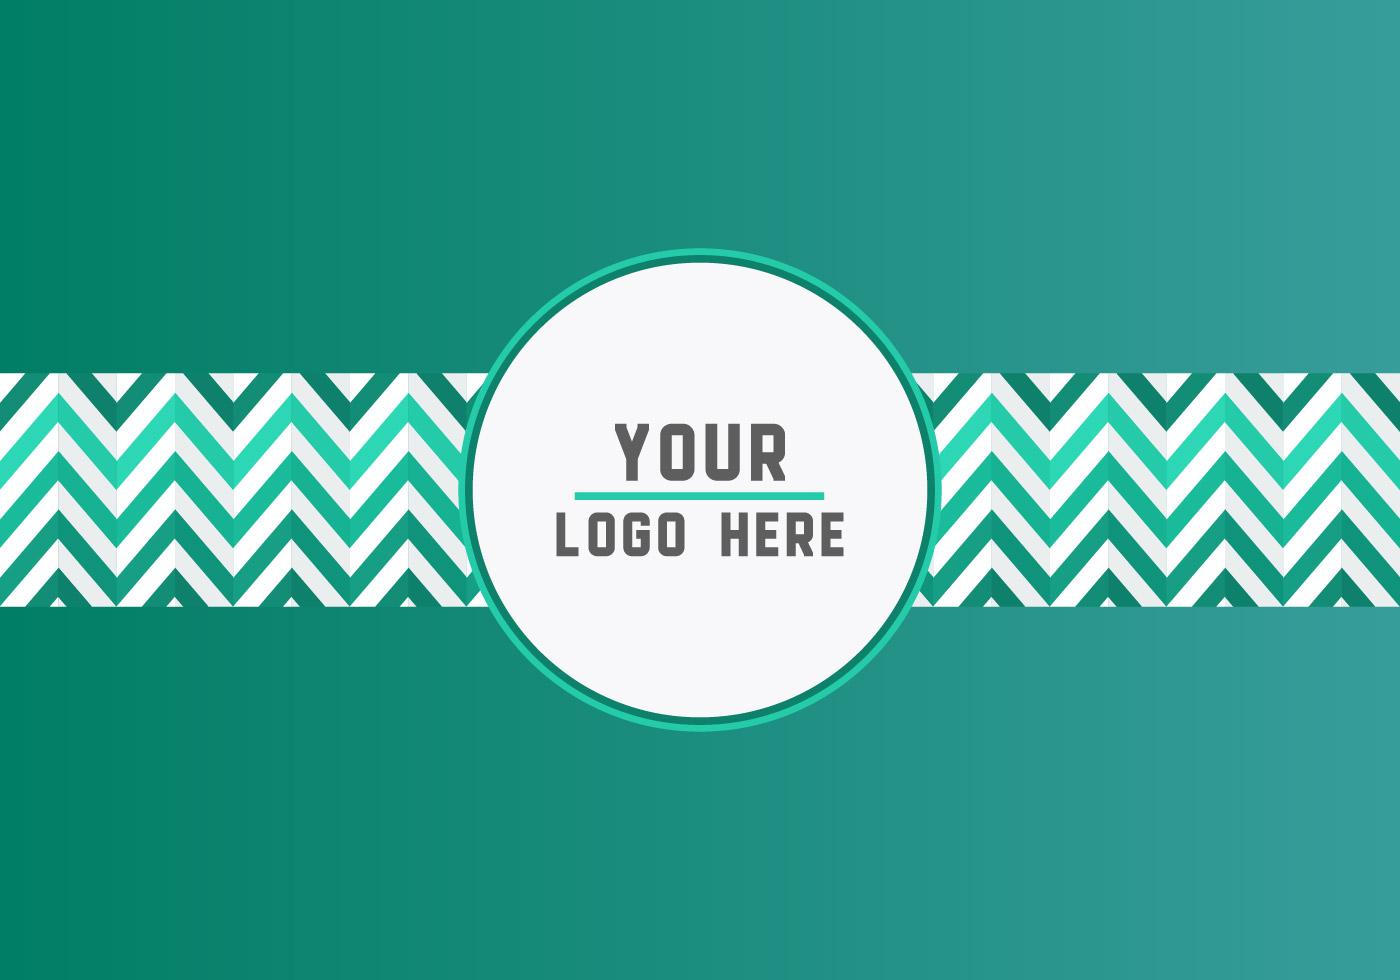 Free Chevron Logo Background - Download Free Vector Art, Stock ...